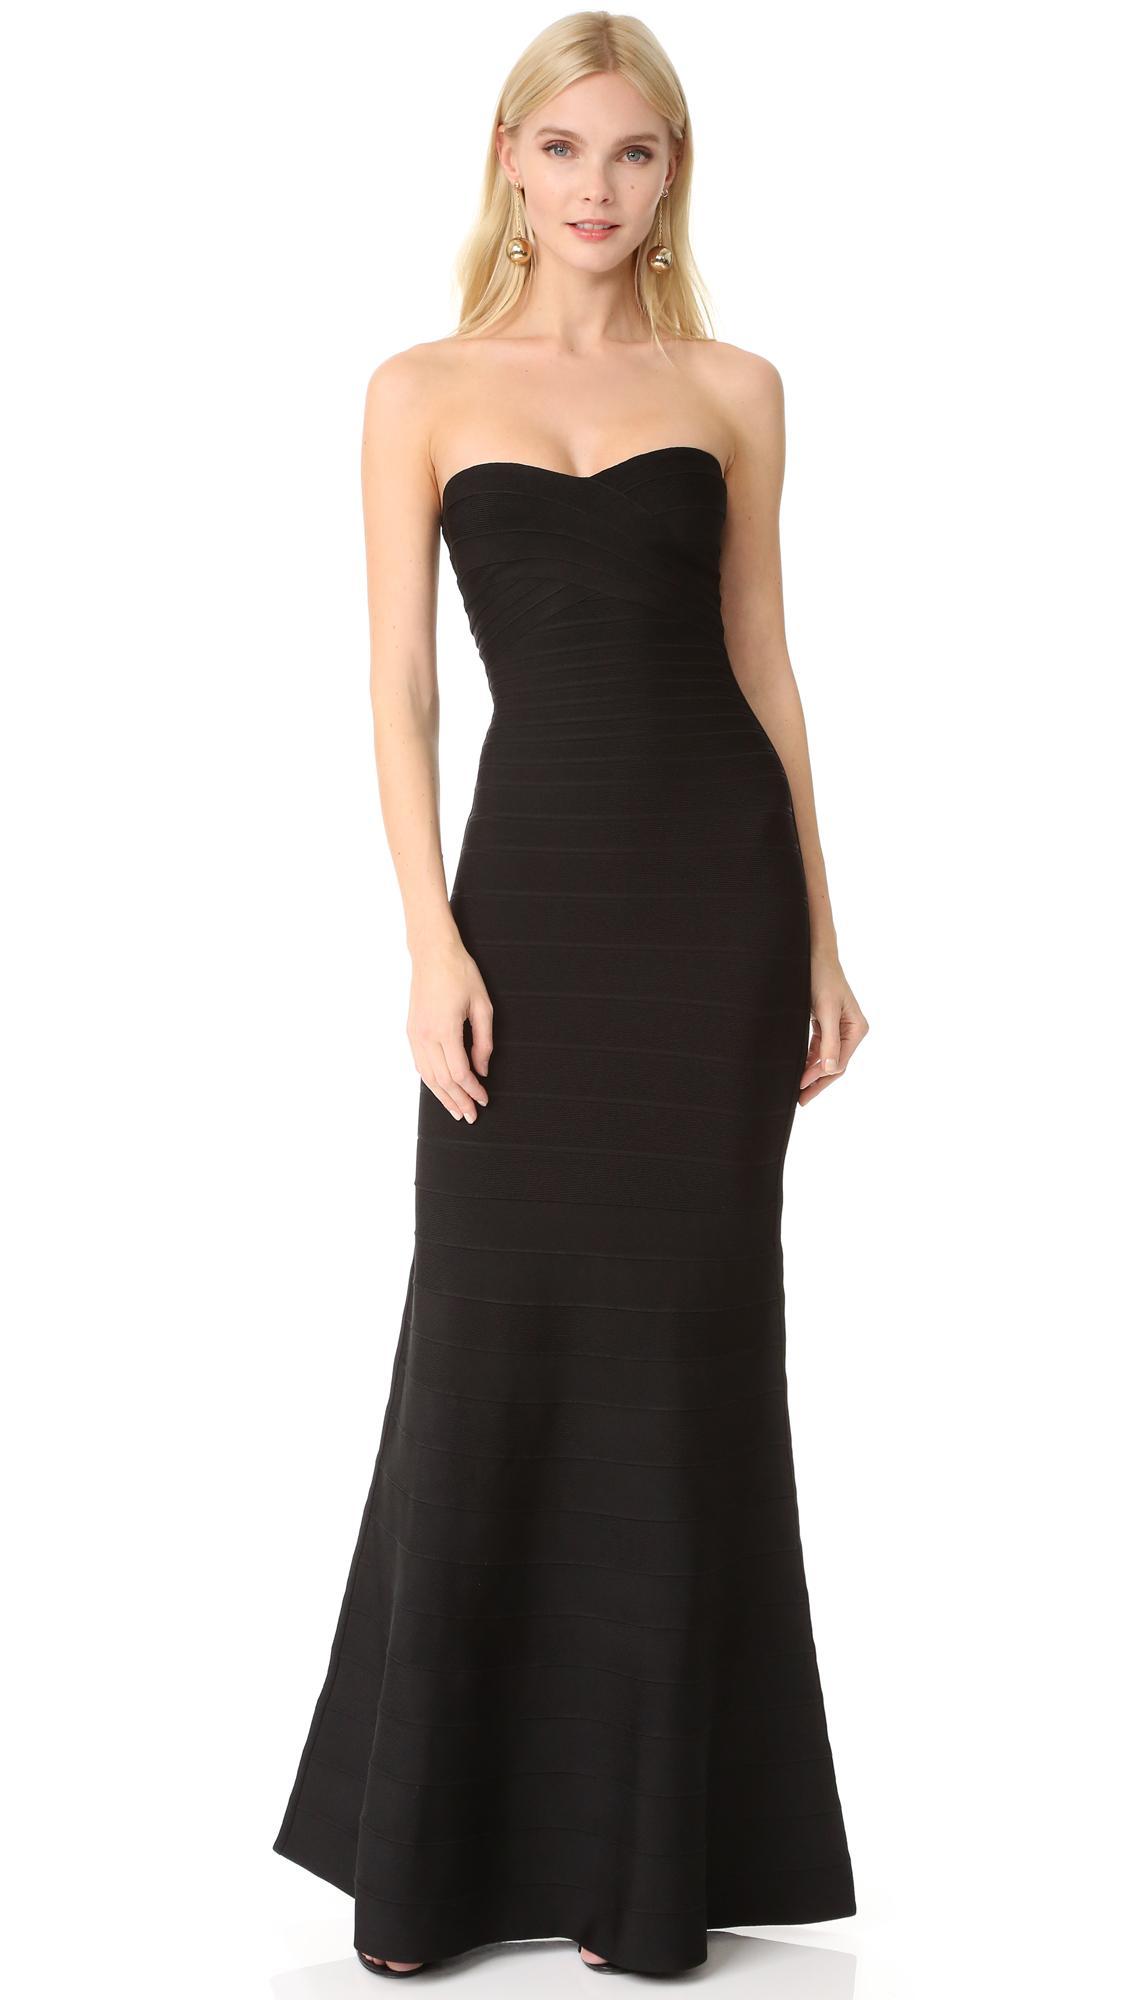 Lyst - Hervé Léger Strapless Gown in Black